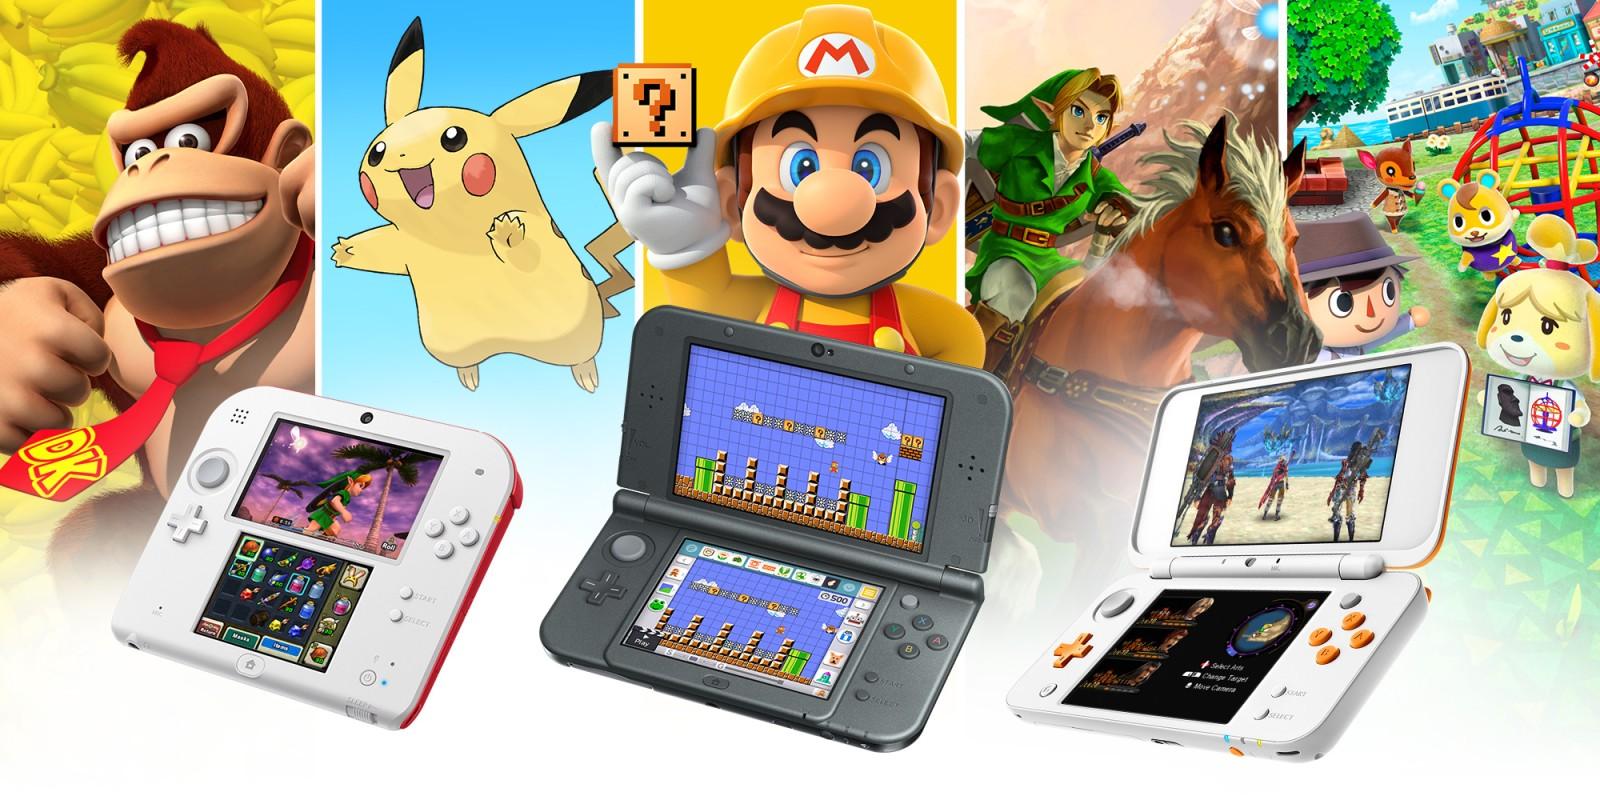 Famille Nintendo 3ds Nintendo